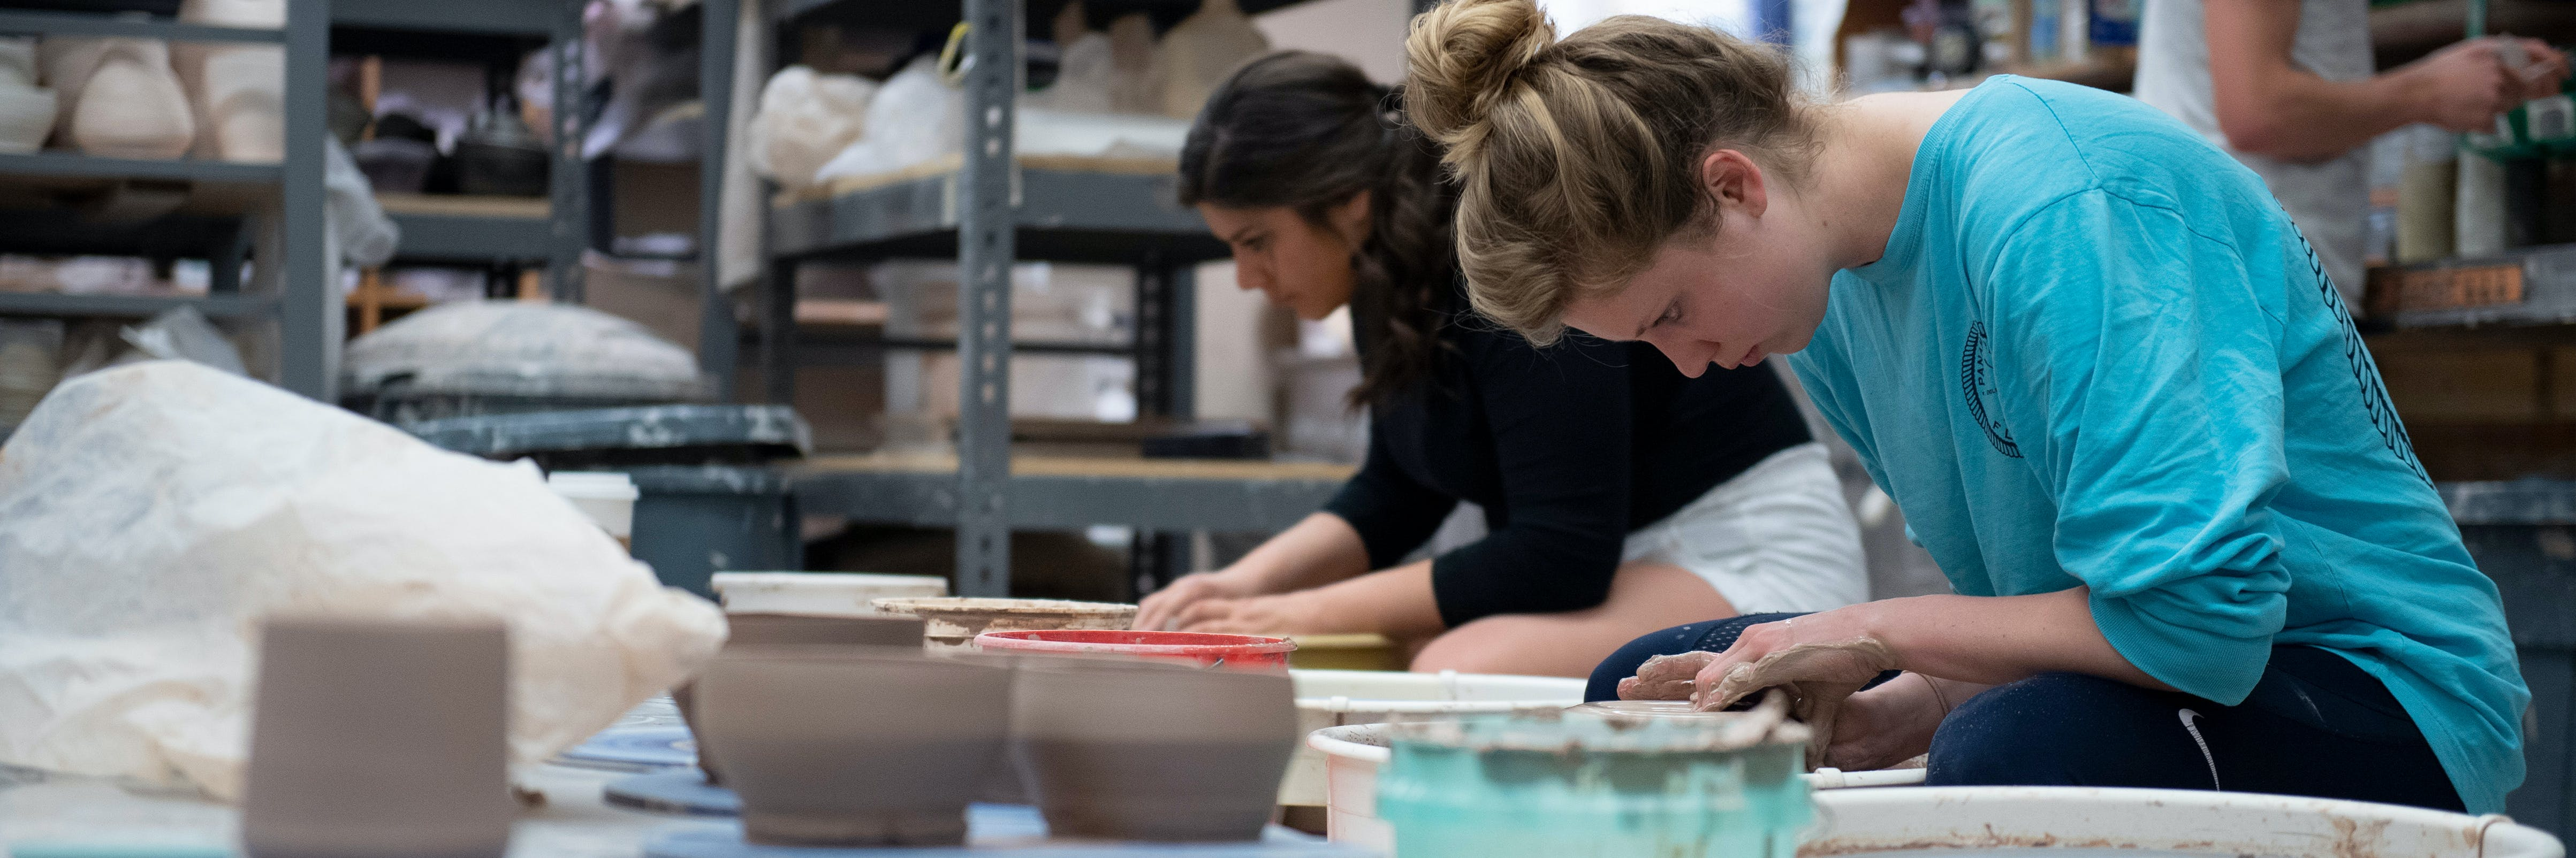 Art students sitting at throwing wheel in ceramics studio